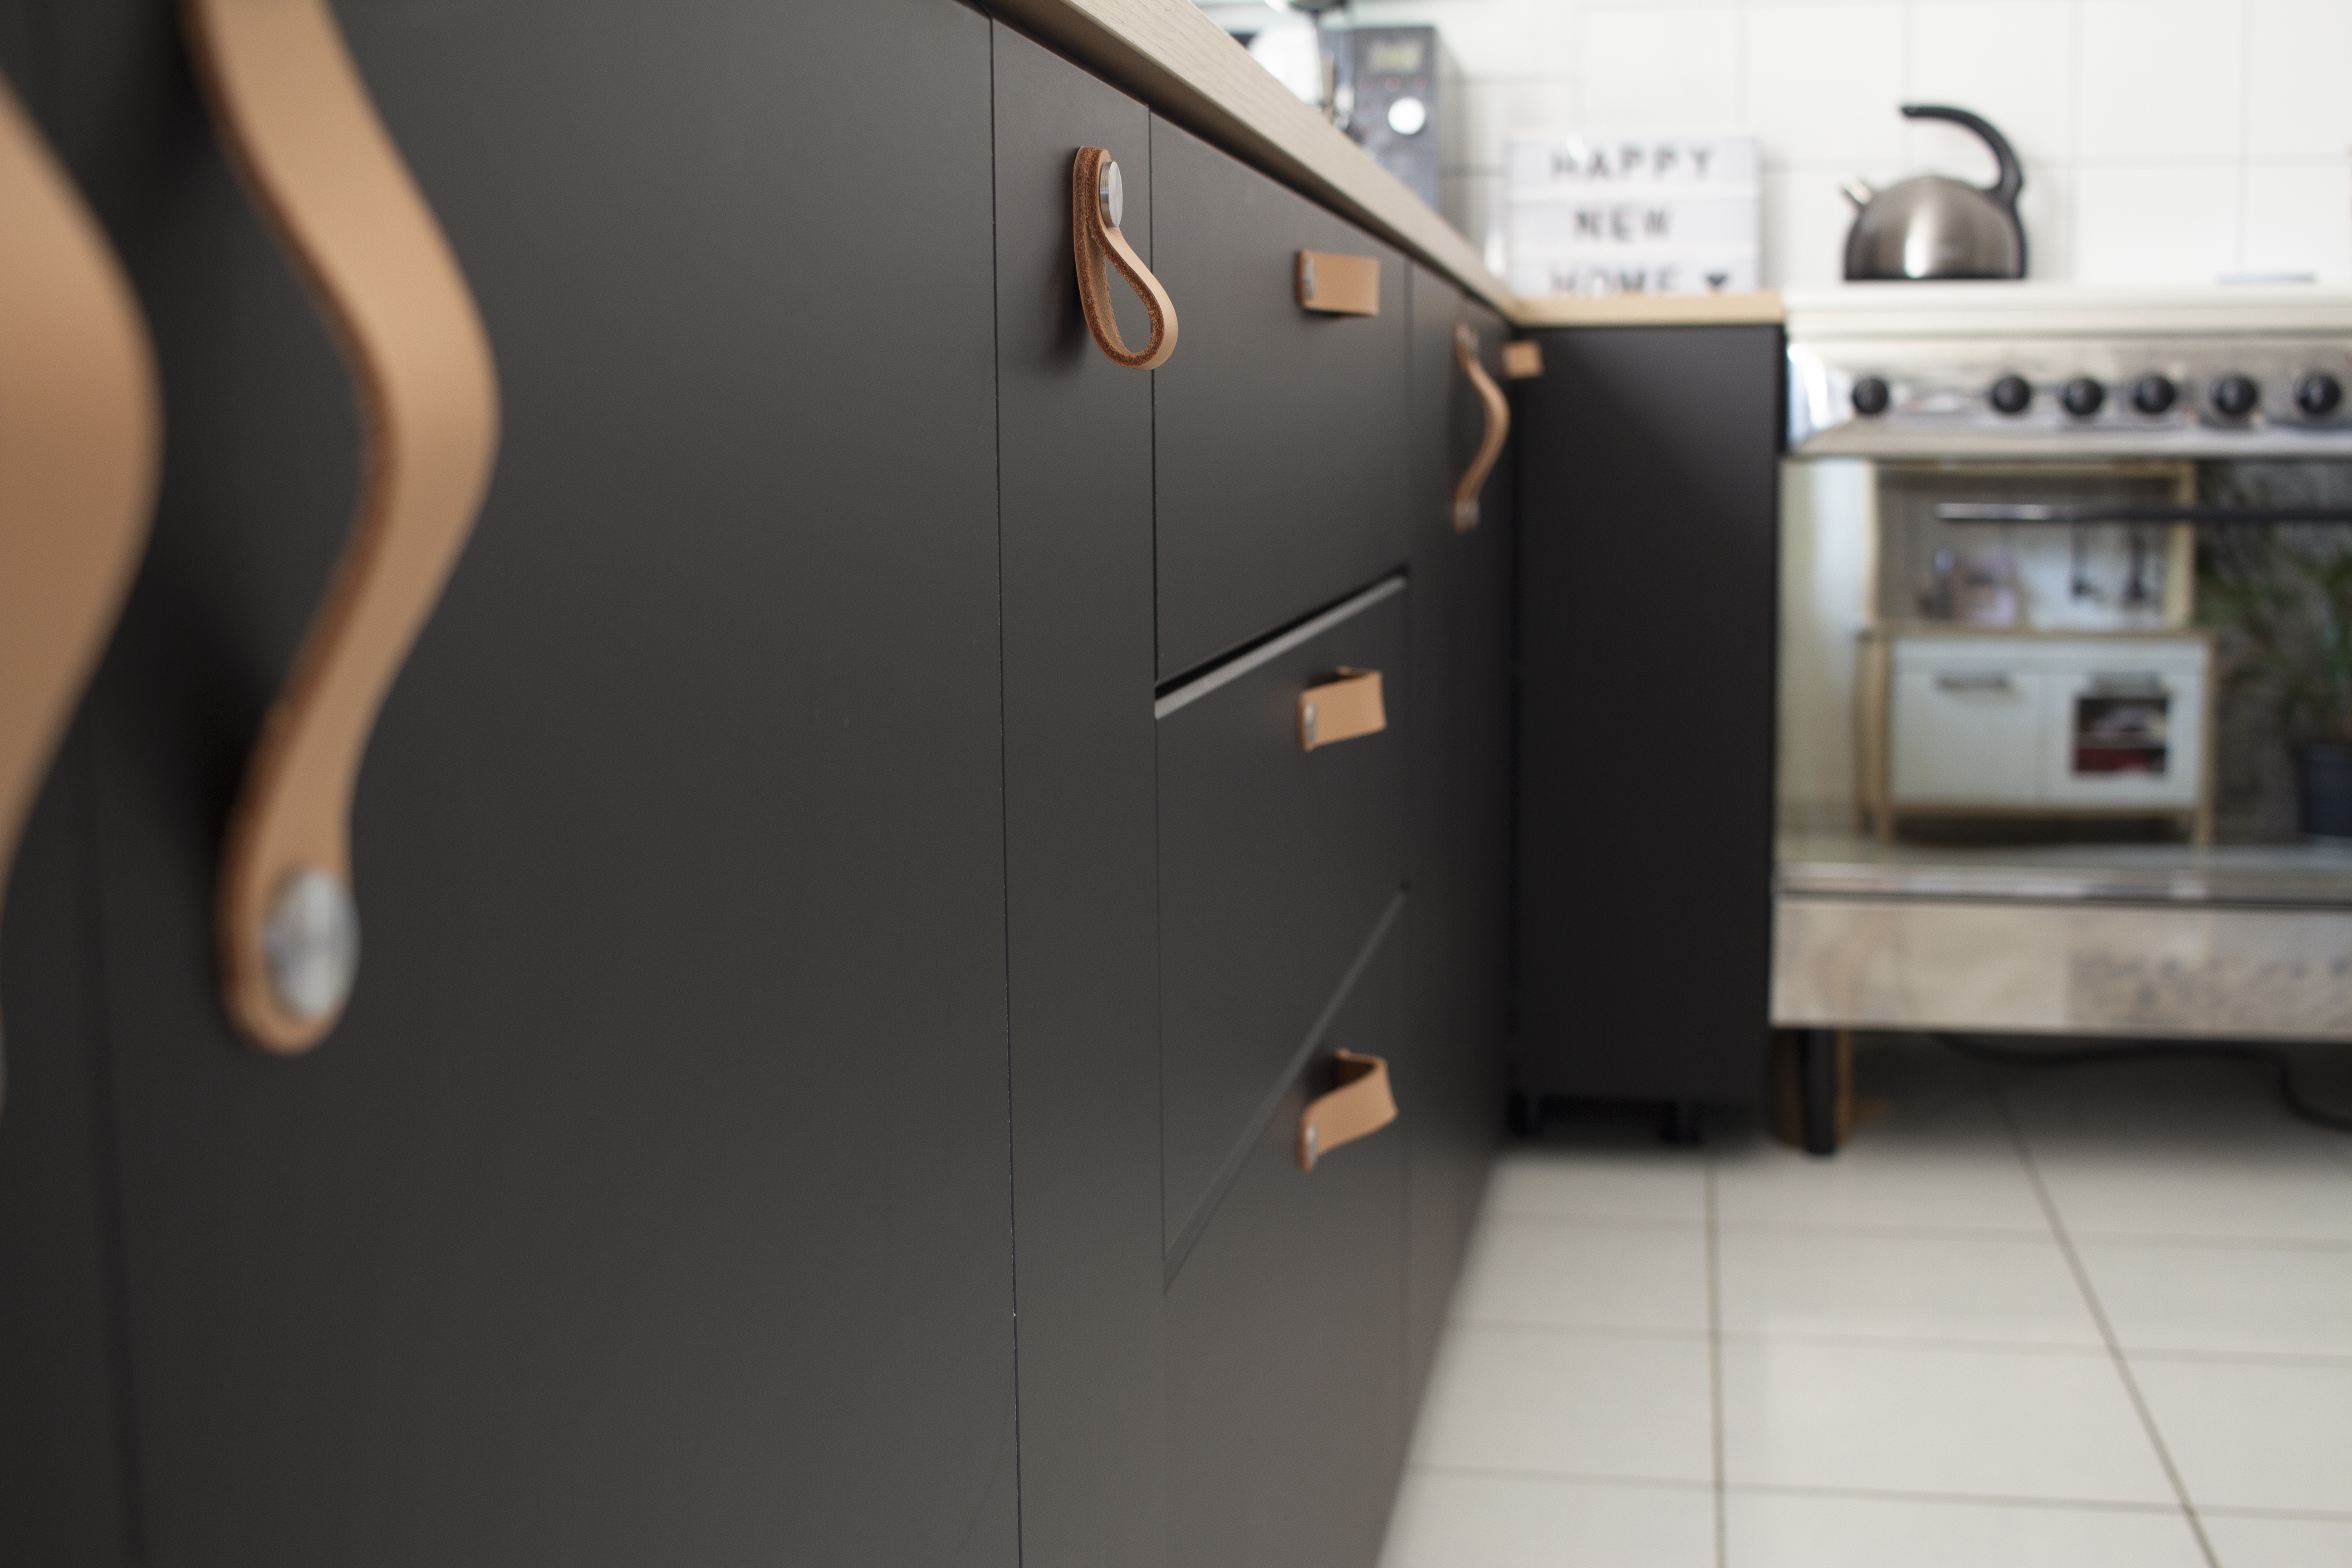 Panneau En Liège Ikea ma cuisine kungsbacka d'ikea - oh! ma déco